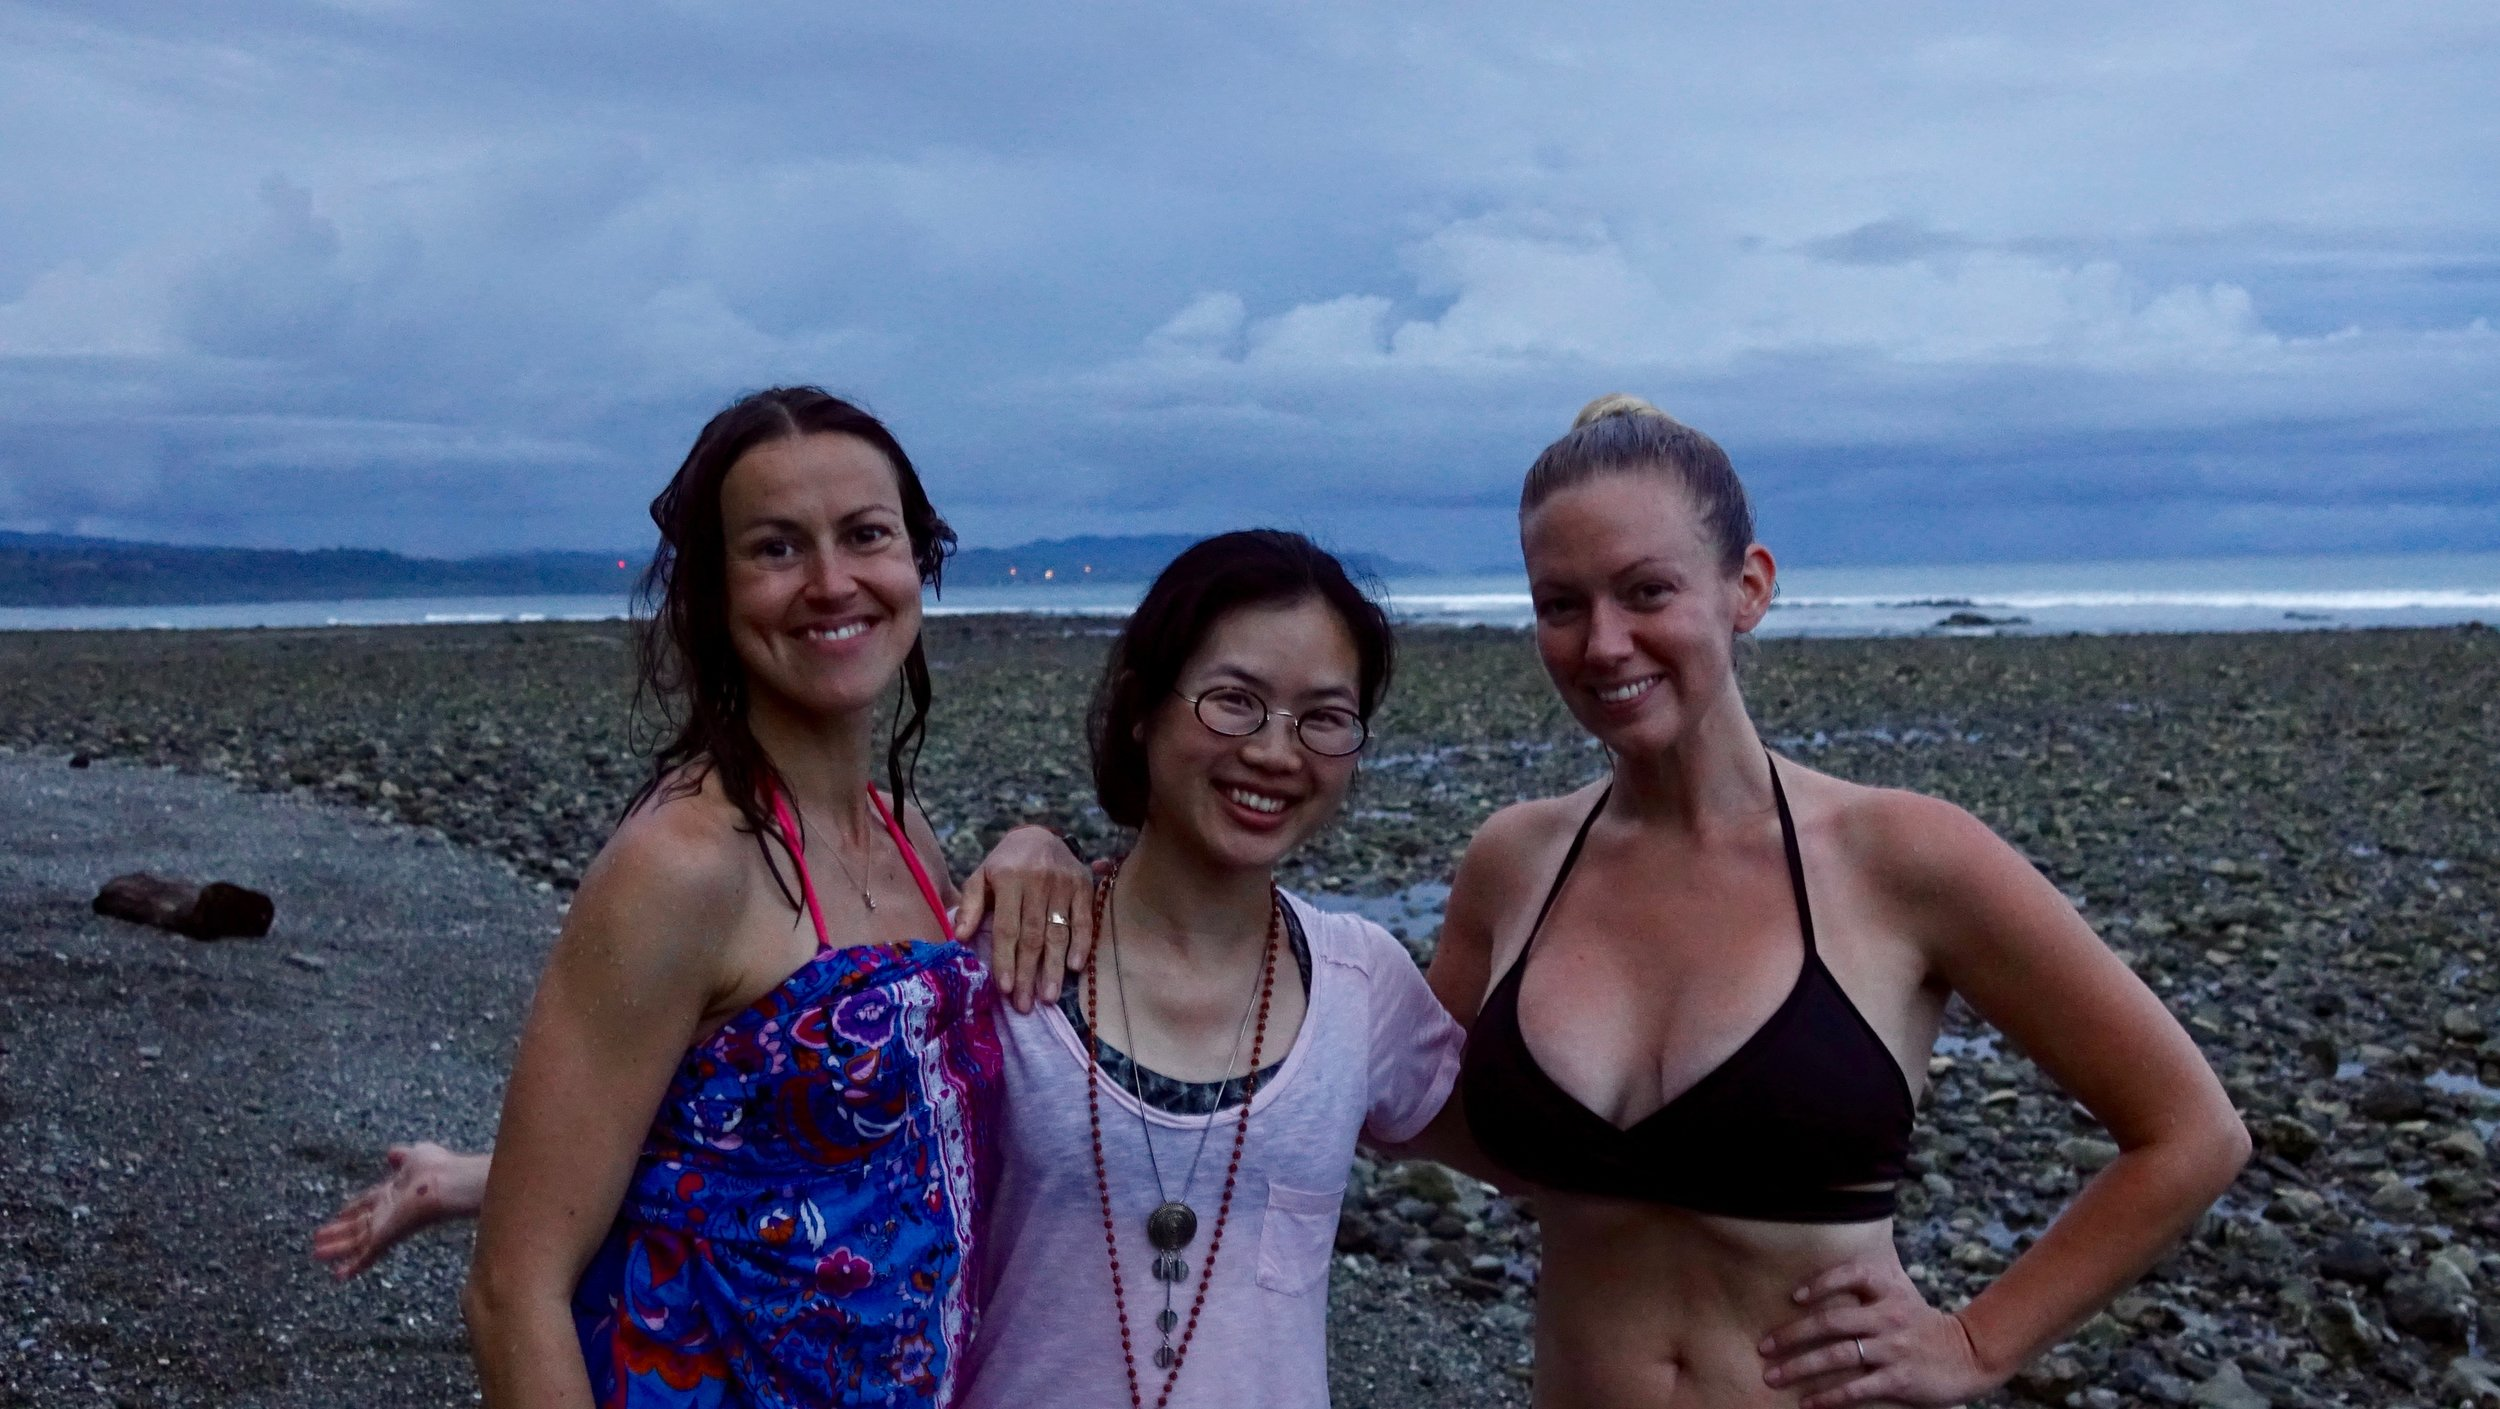 3 girls on beach.jpg